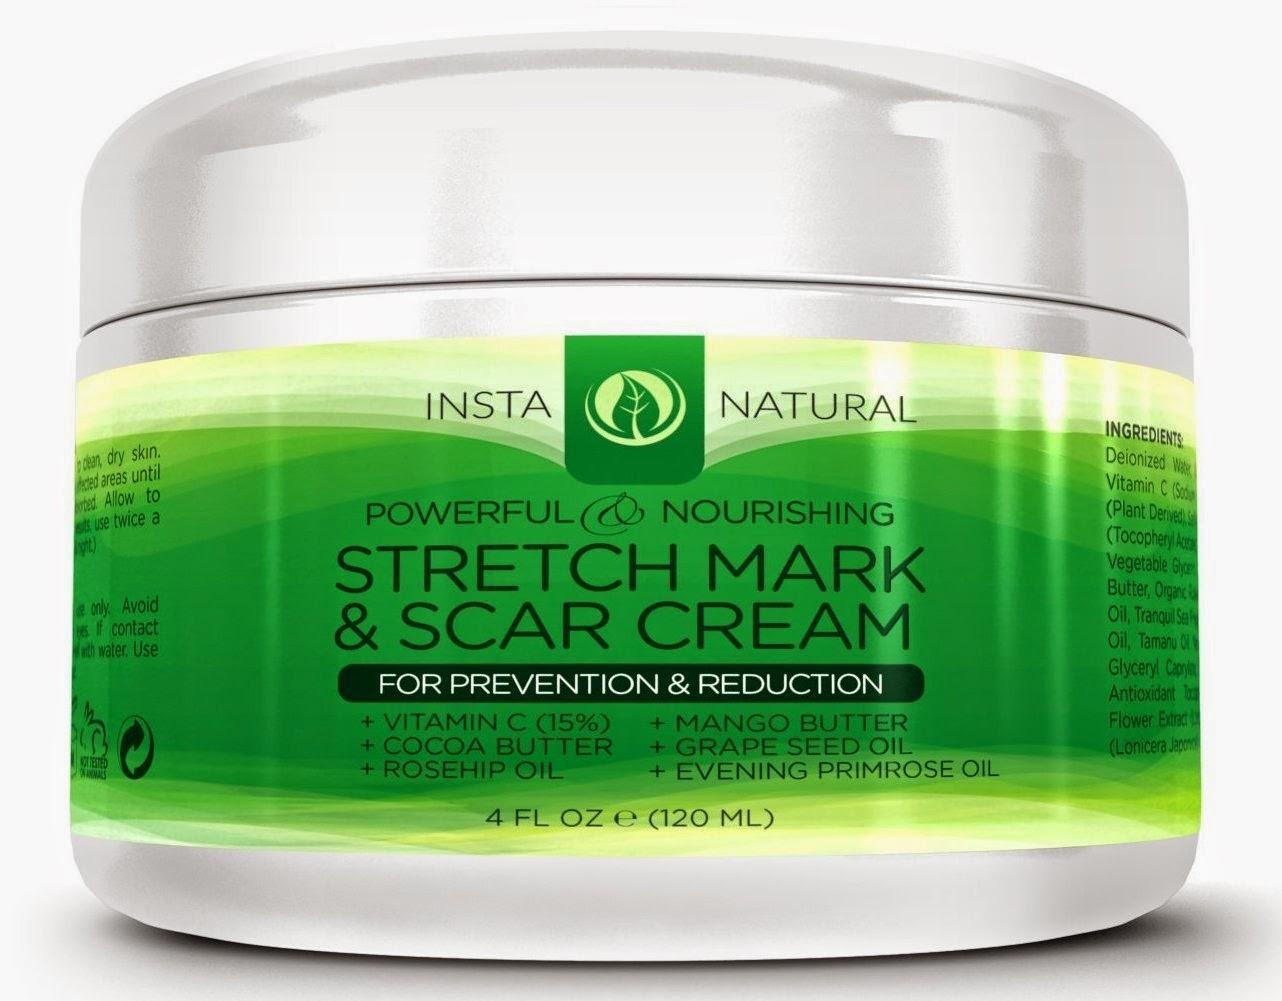 Insta Natural Product Reviews